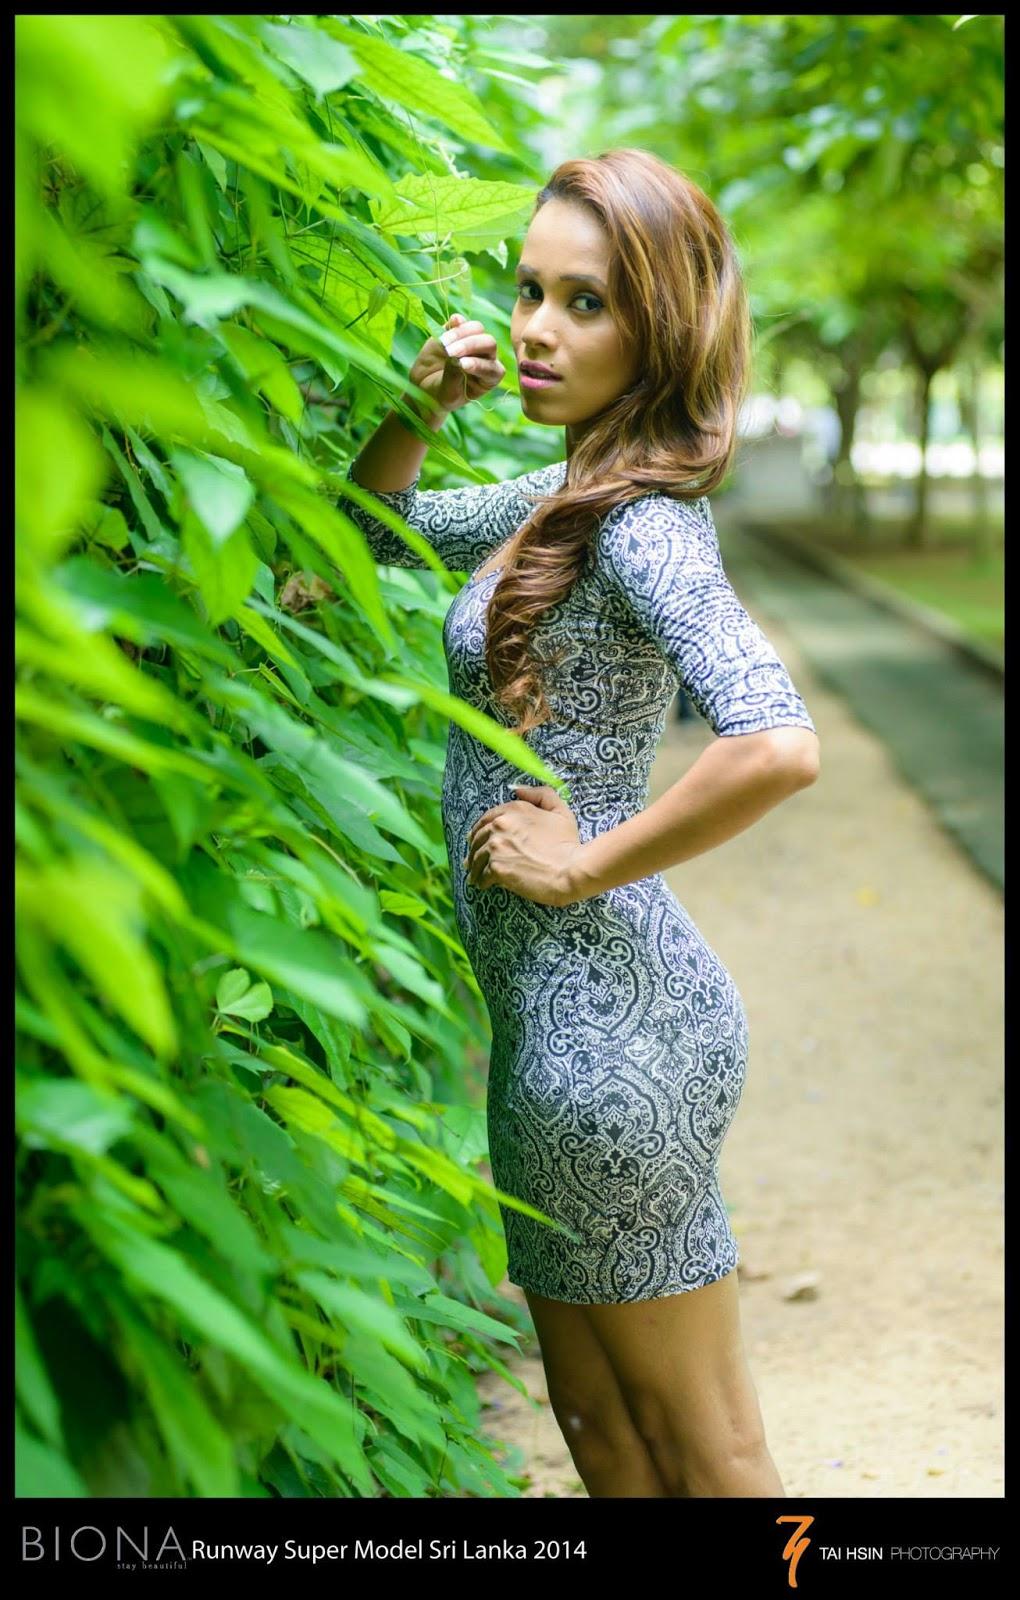 SRI LANKAN TASTE Fashion Magazine: Hot & Sexy Sewvandi